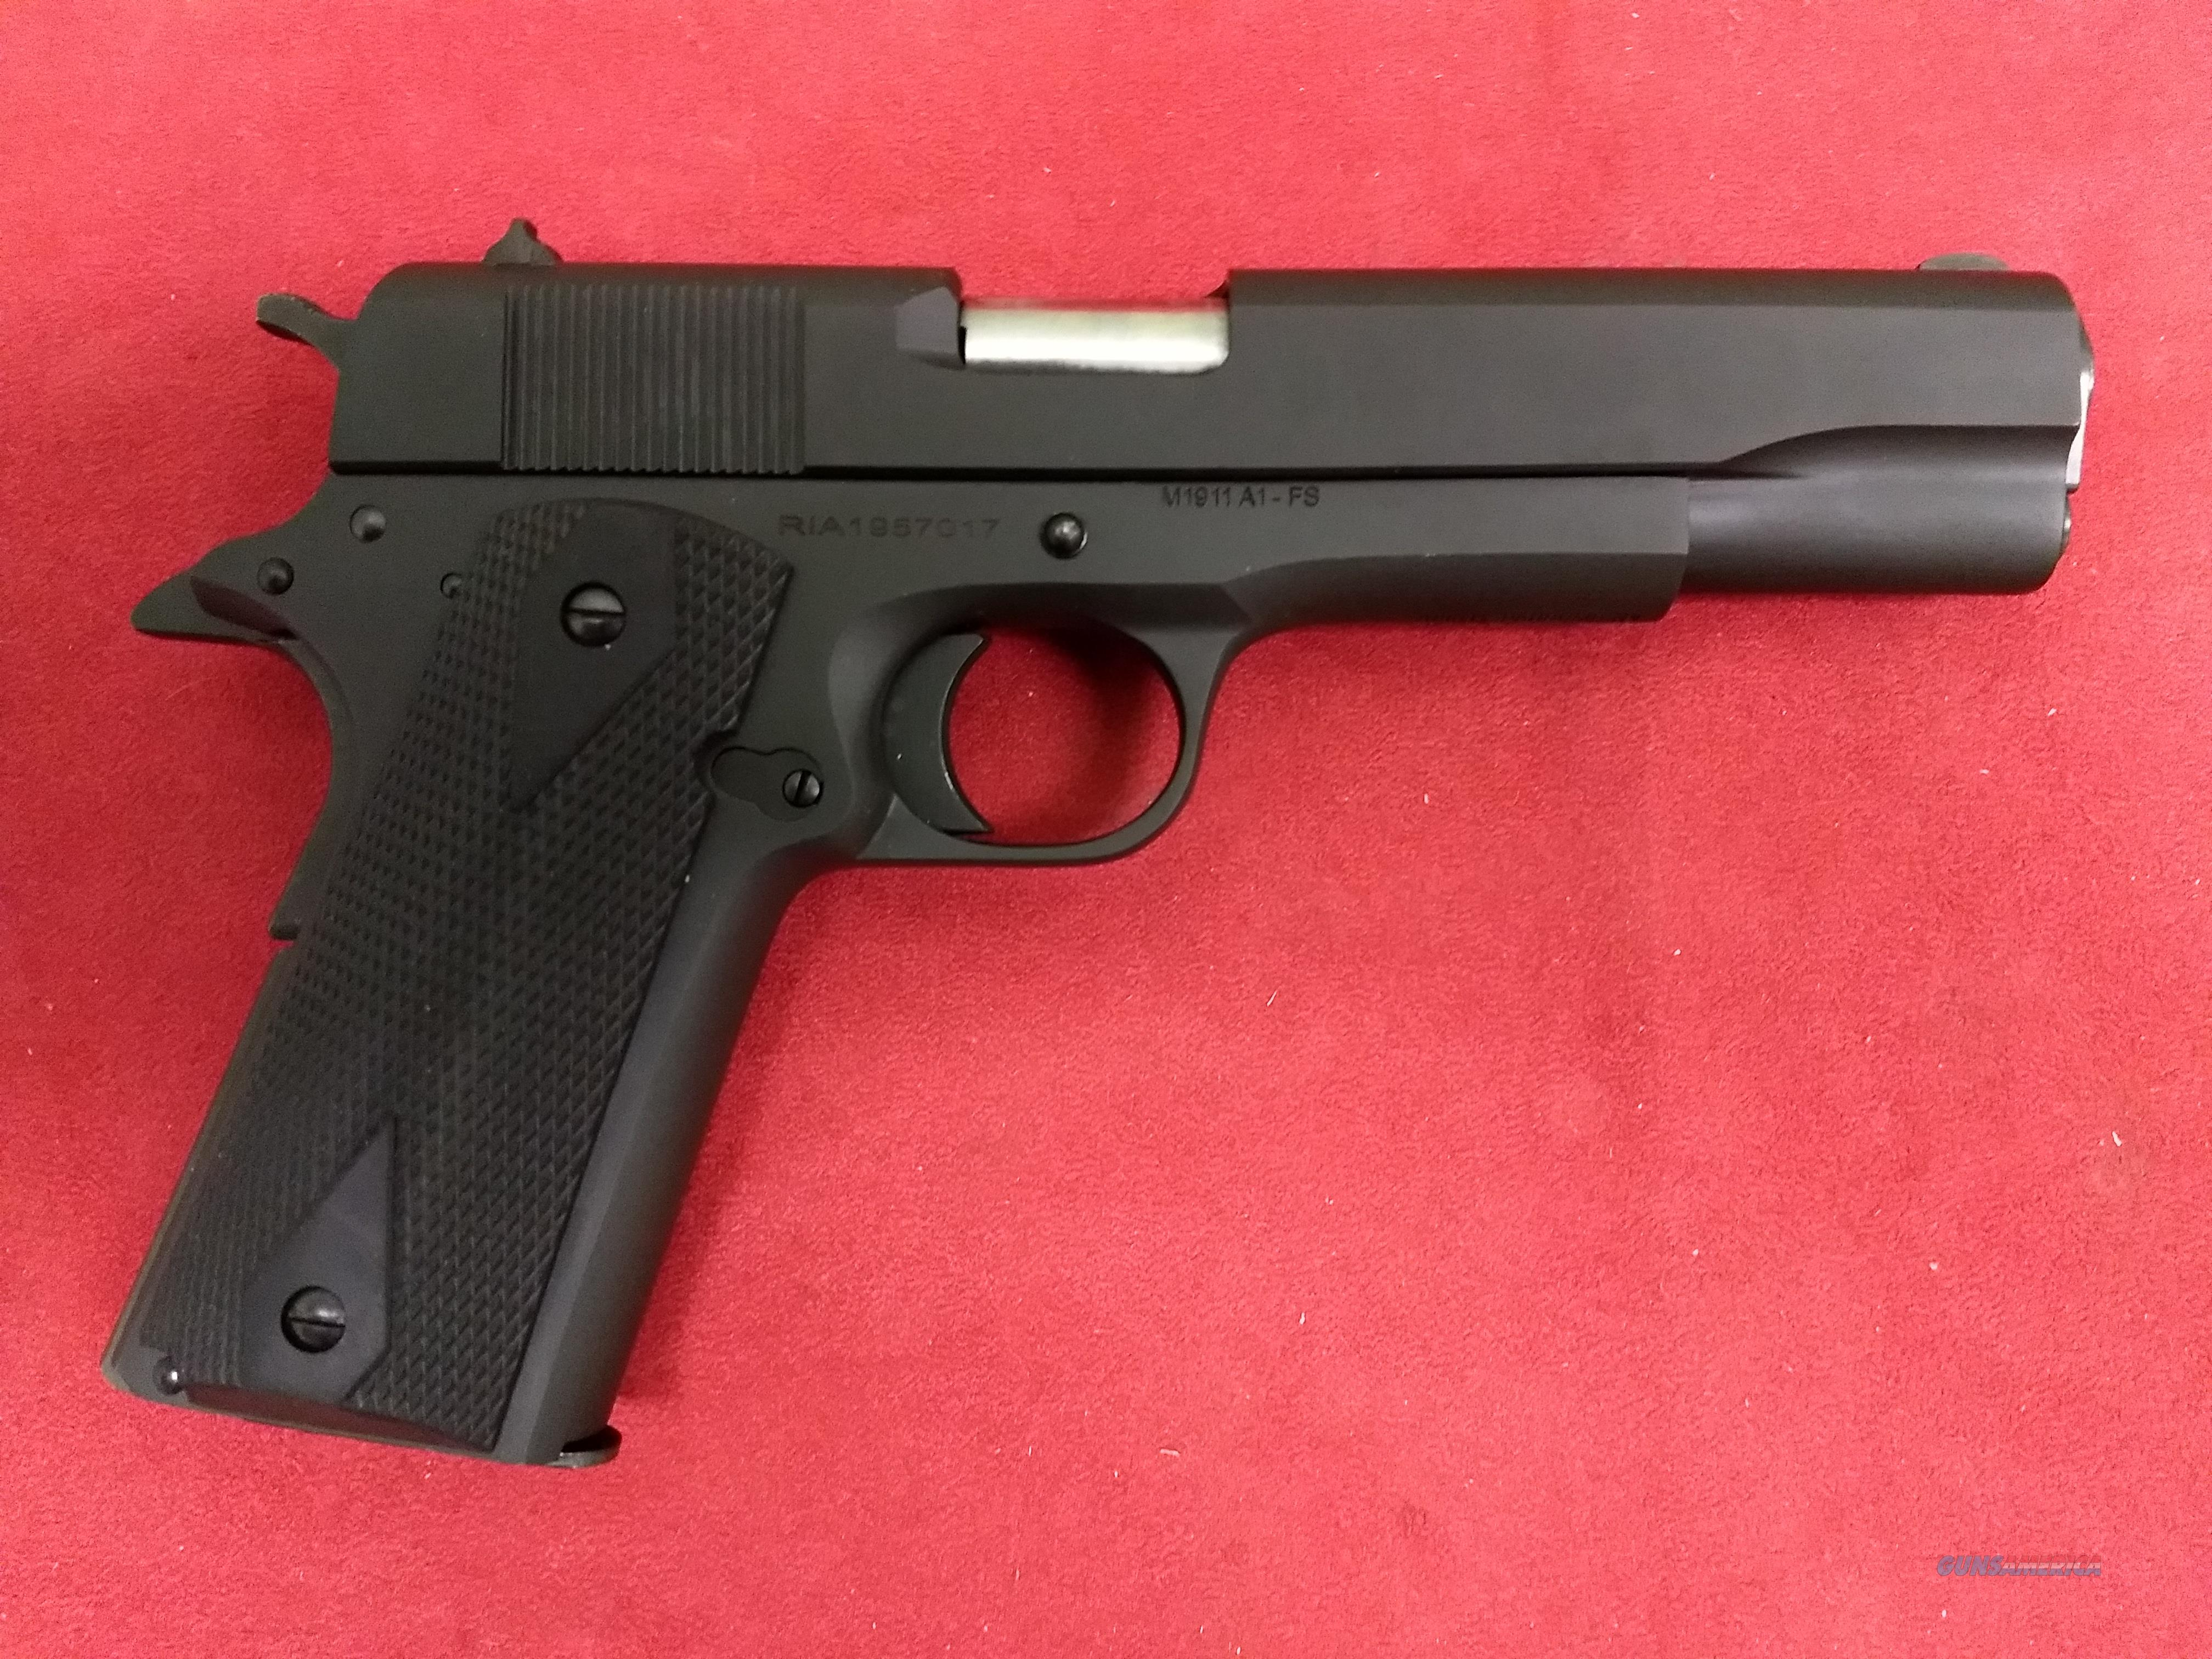 Rock Island Armory M1911A1-FS, .38 Super, NIB  Guns > Pistols > Rock Island Armory Pistols > Rock Island